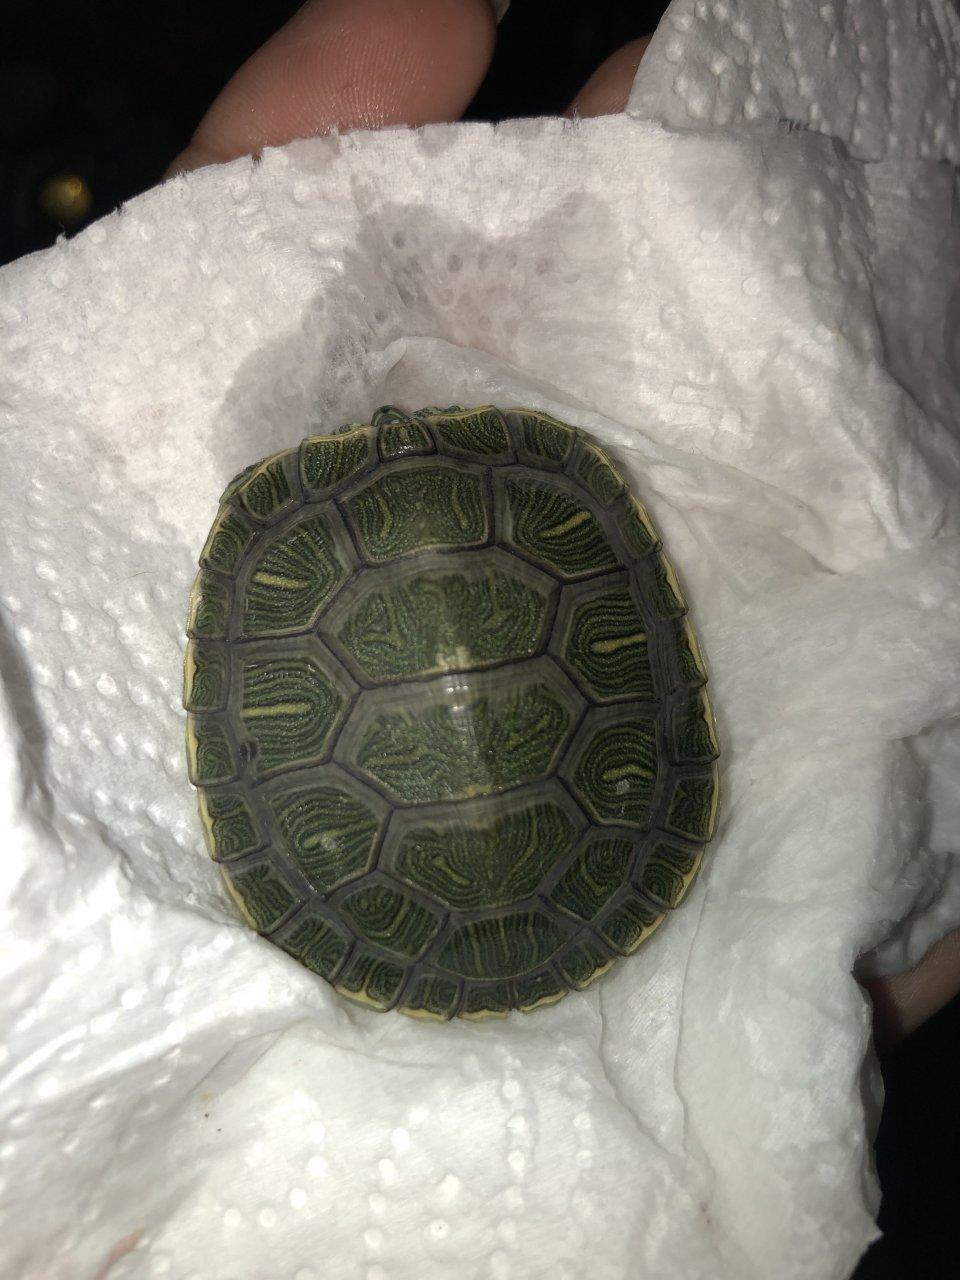 I'm Not Sure If My Turtle Has Shell Rot | My Aquarium Club